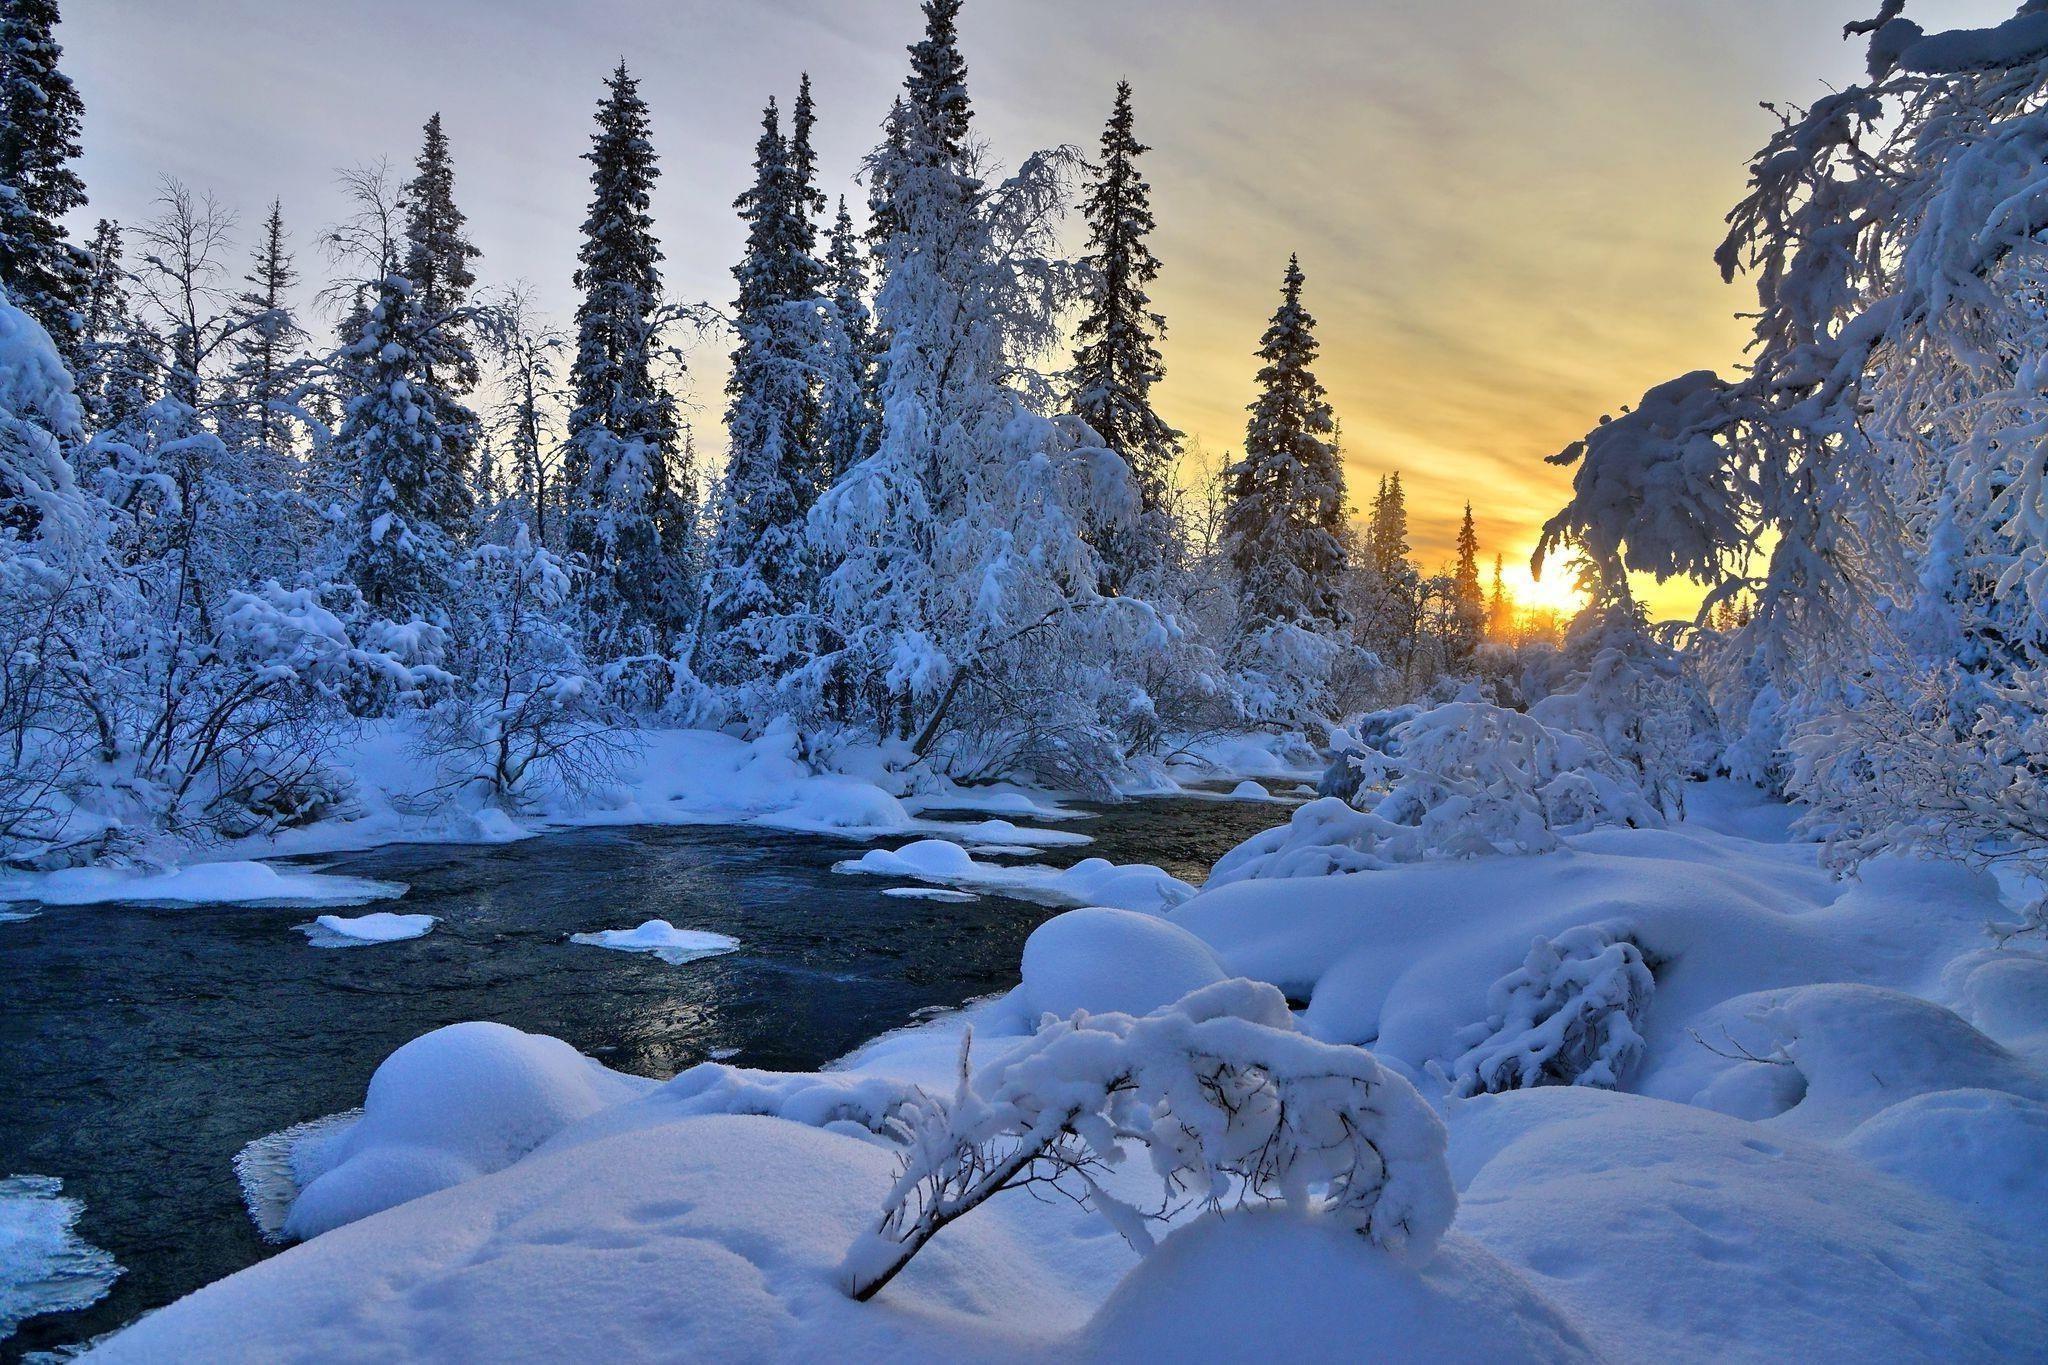 Winter River Nature Trees Landscape 1080p